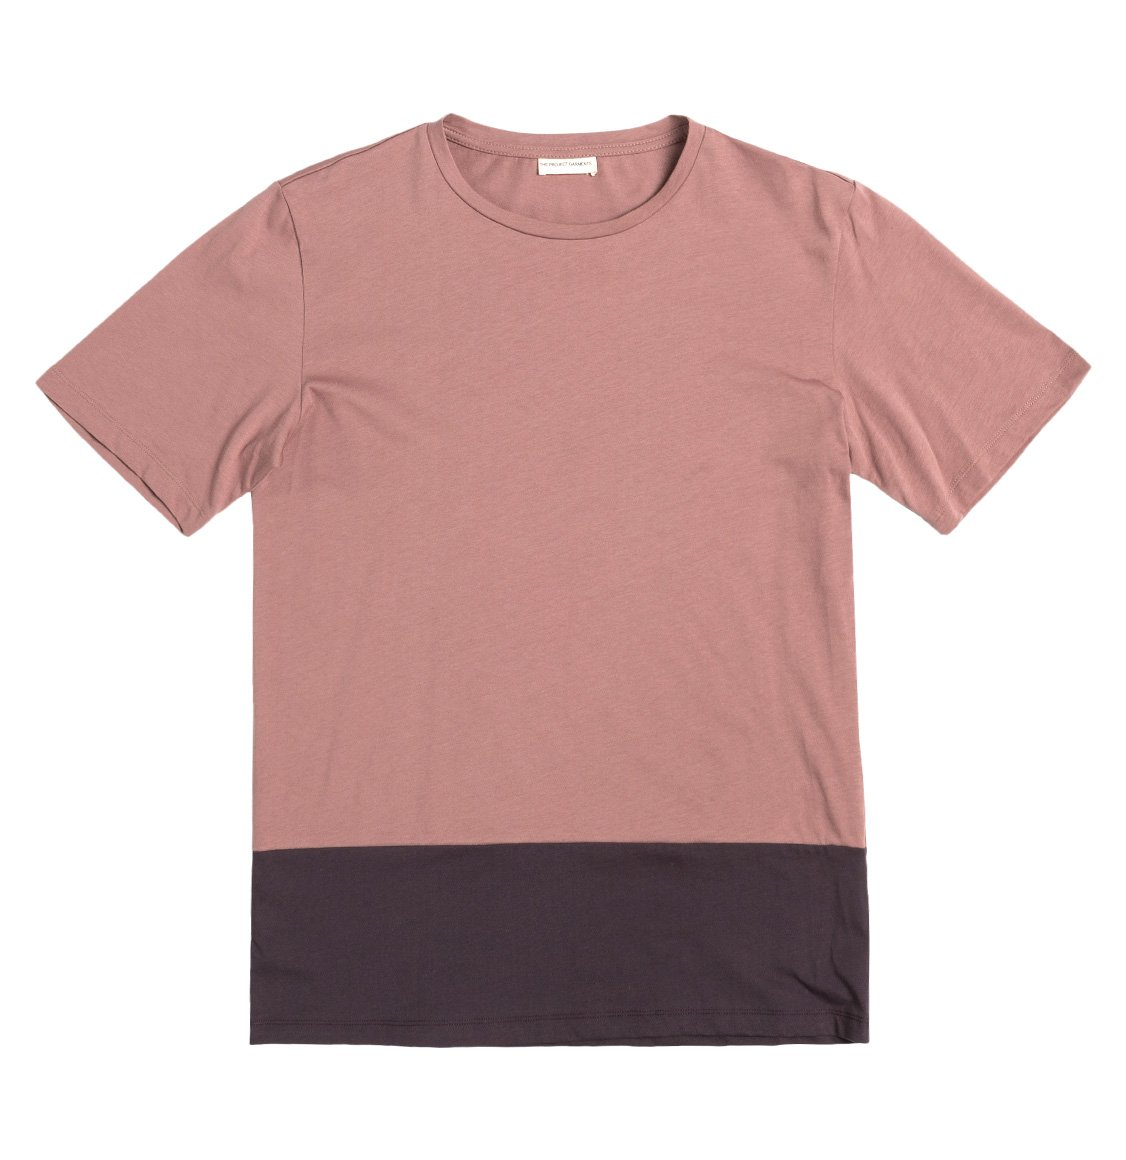 The Project Garments Color Block Crew Neck T-Shirt Powder